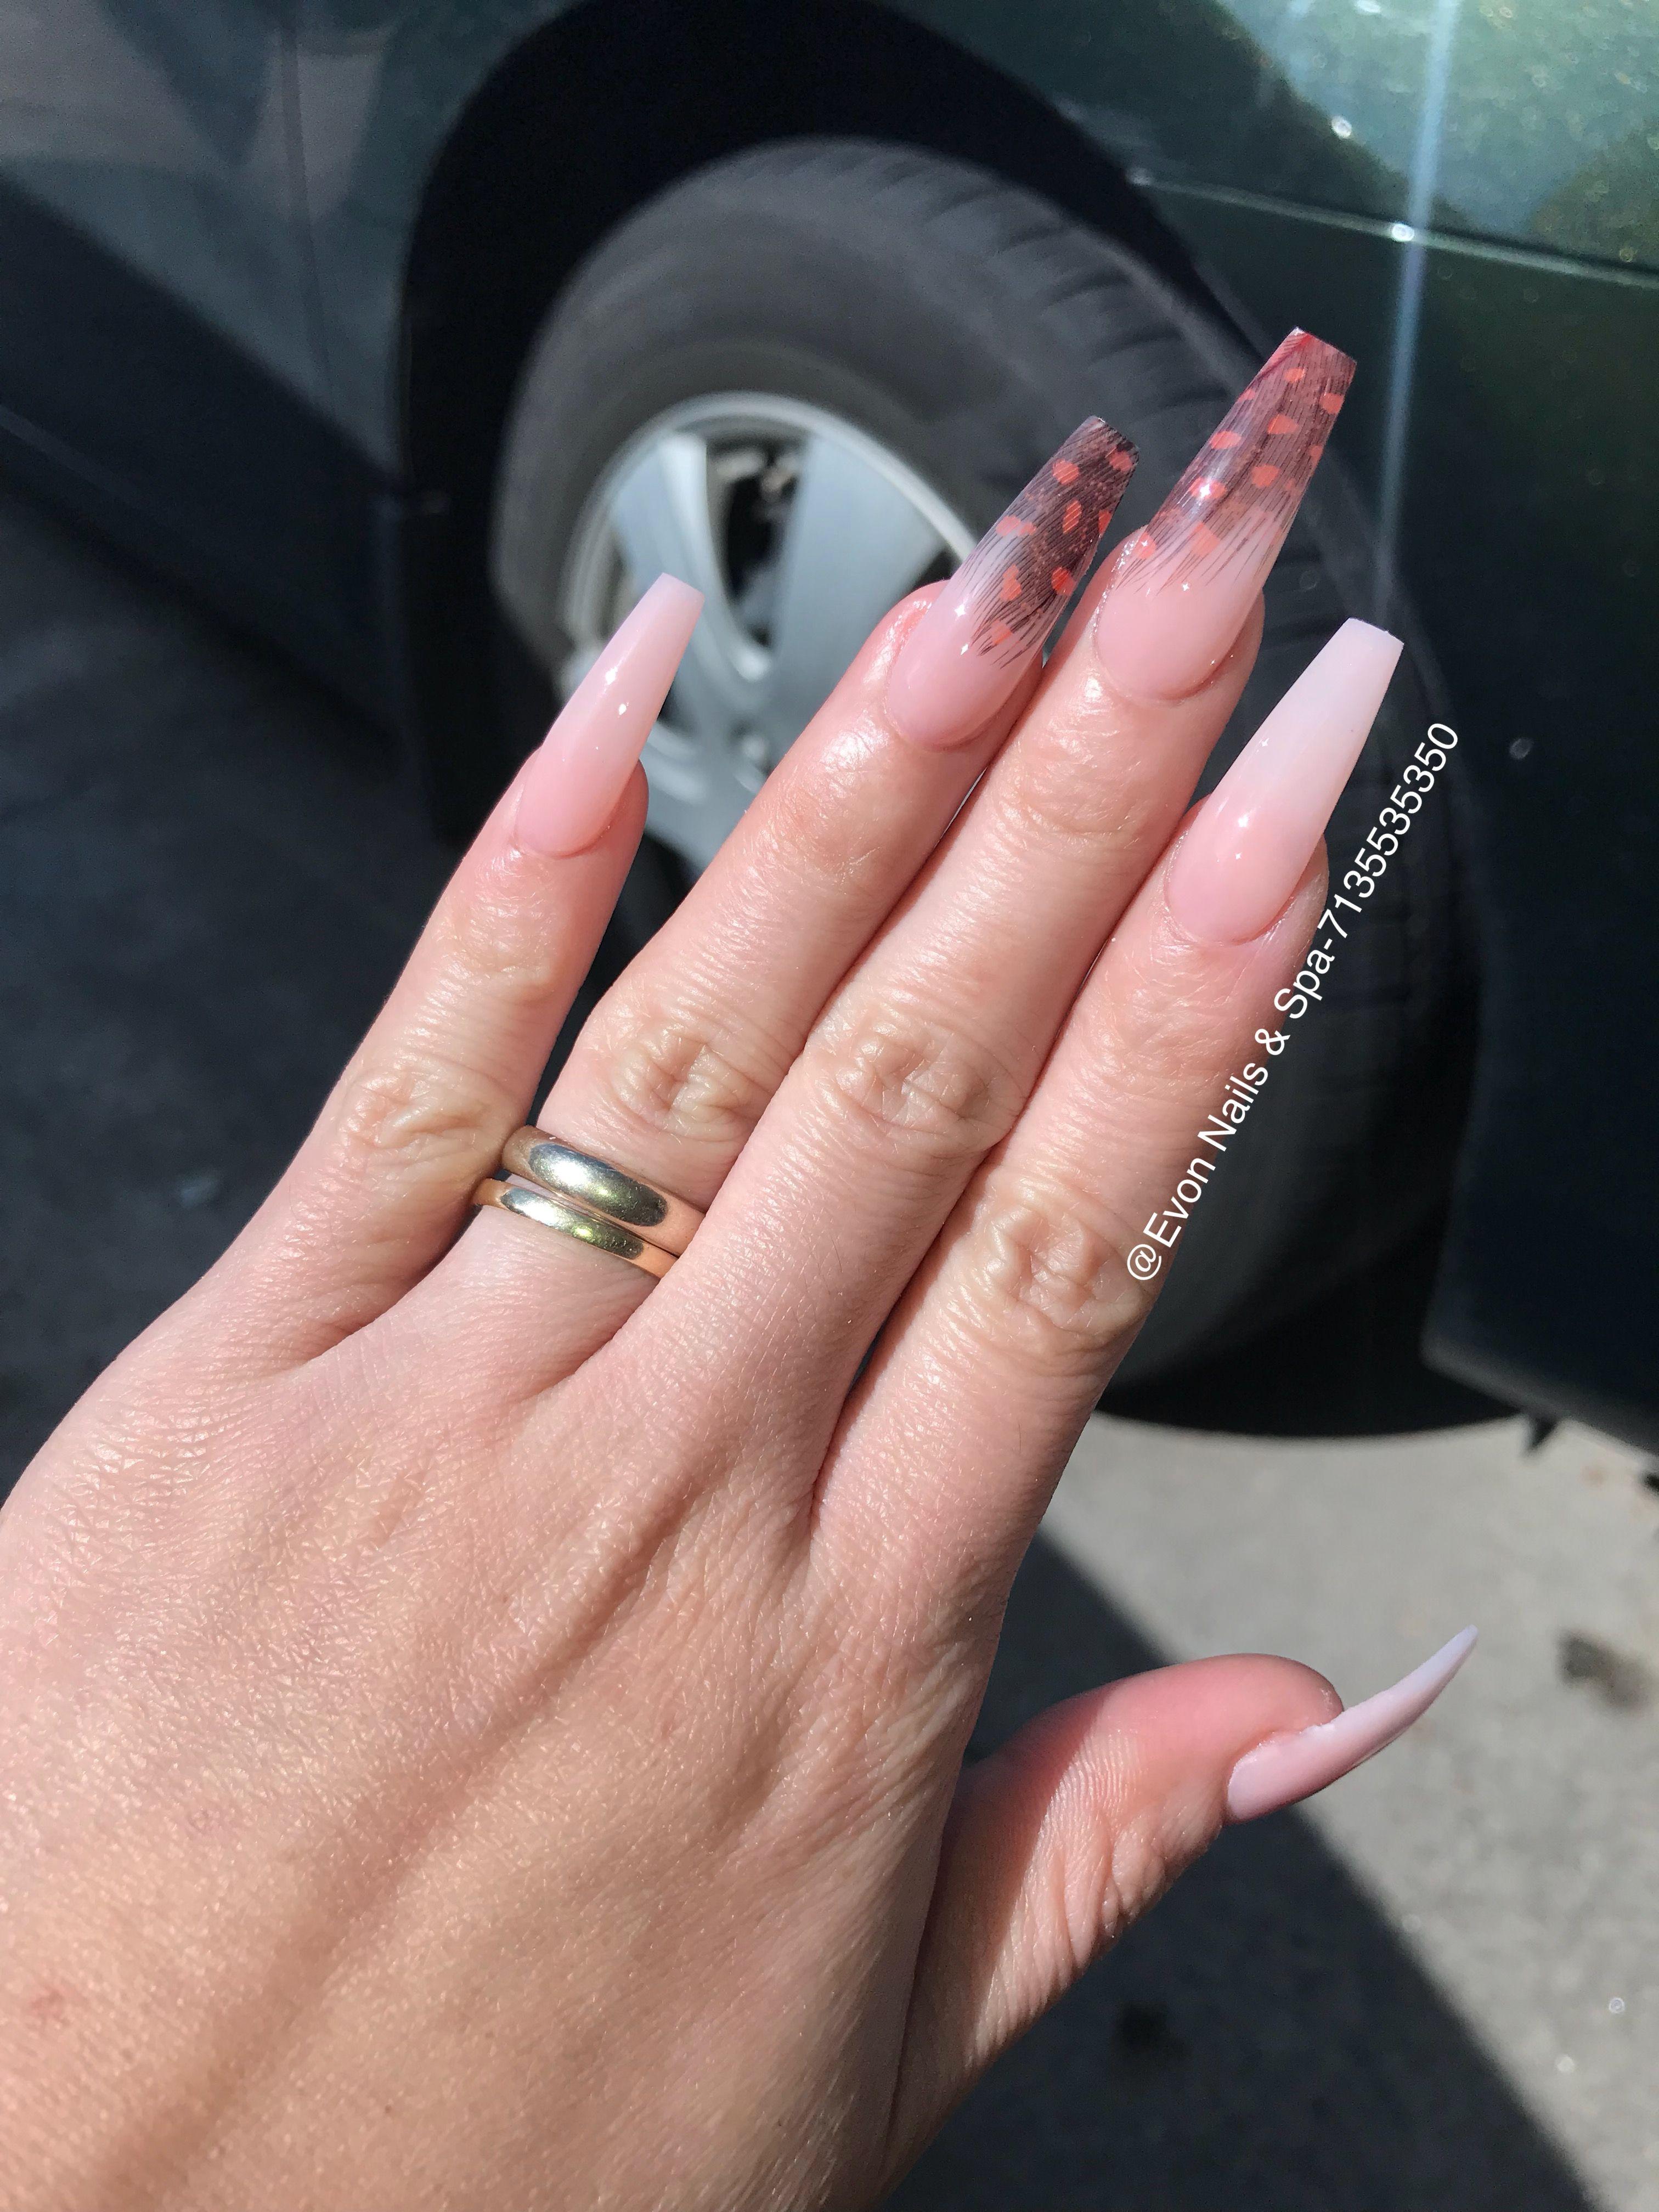 Pin by Evon Nails & Spa on Evon nails & spa . Instagram @ evon nails ...